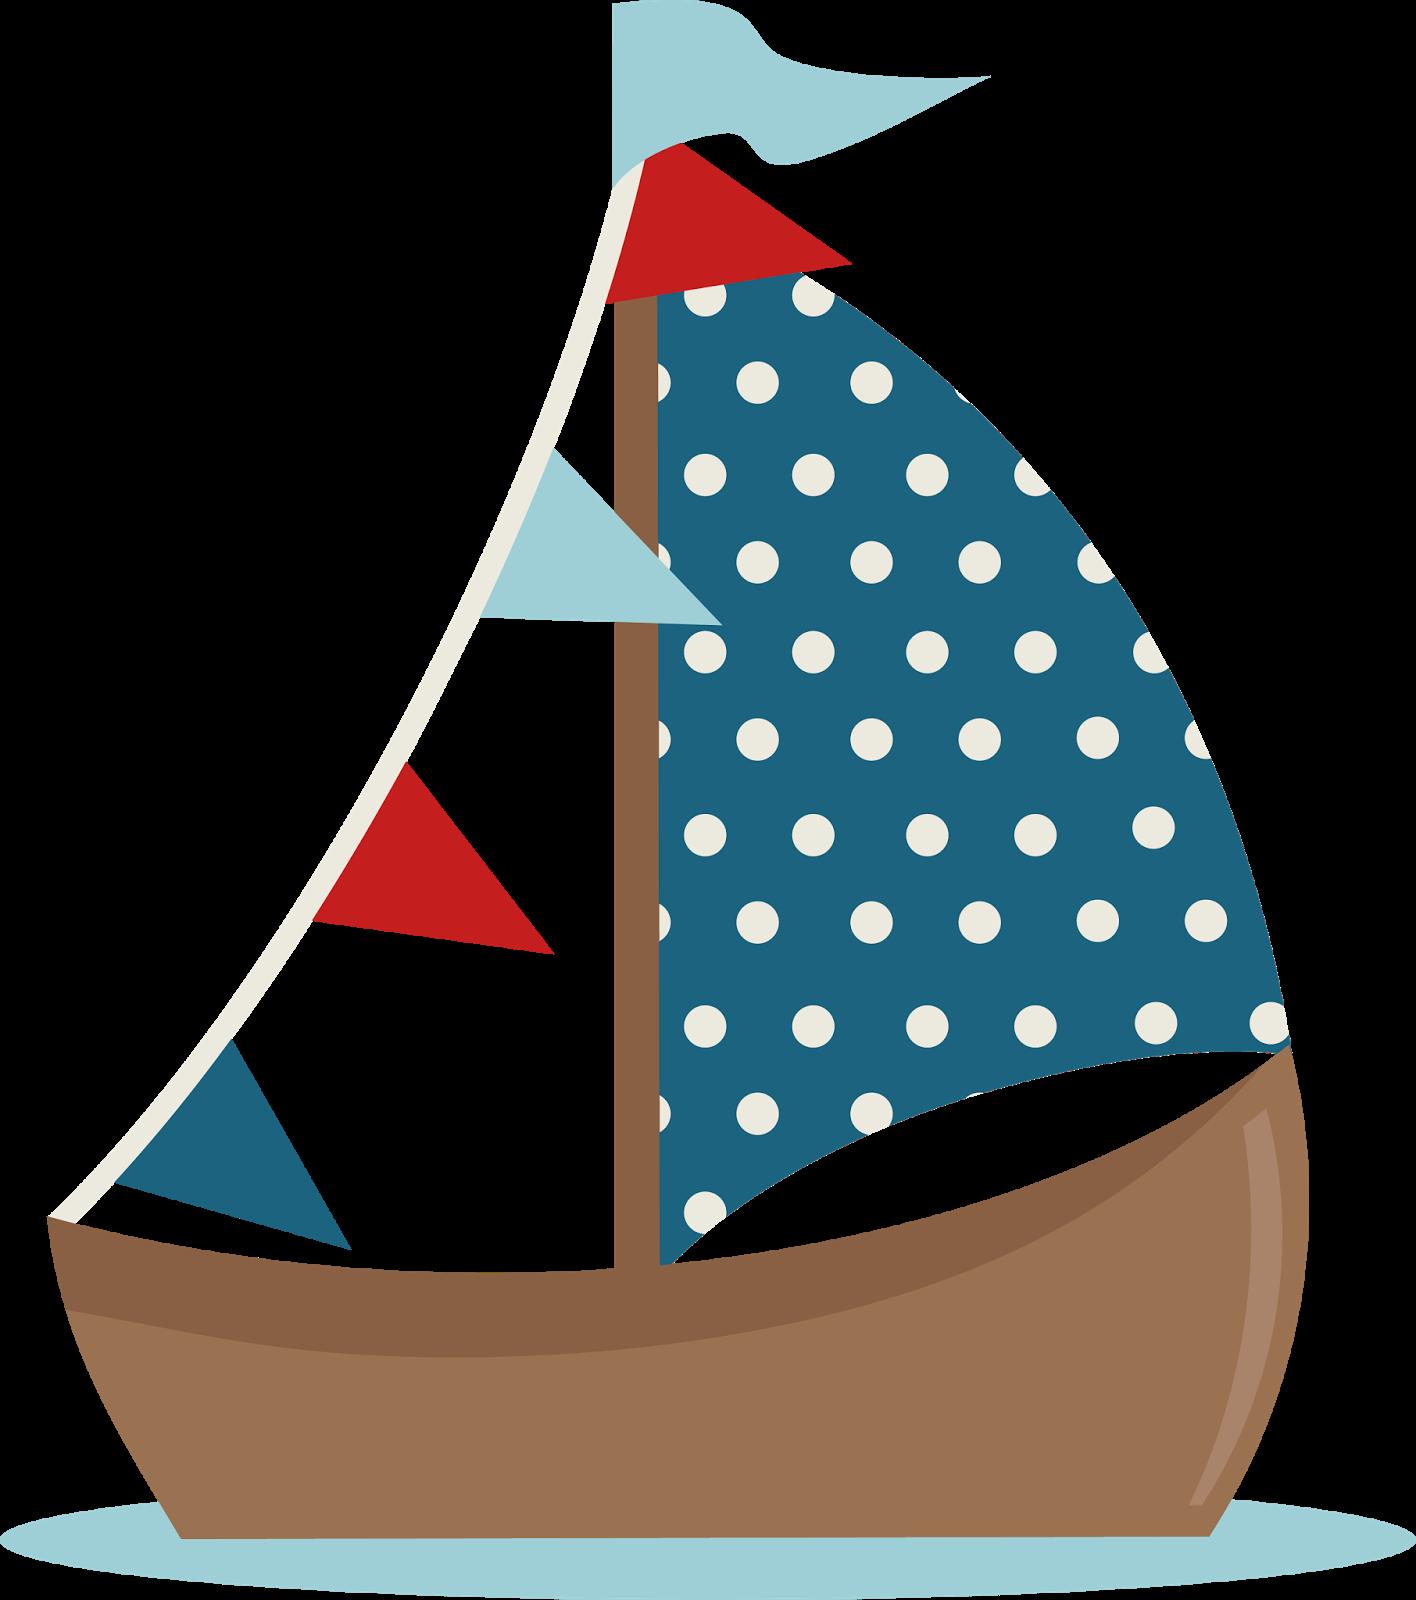 clip art sailing 021   Clipart Panda - Free Clipart Images  Beach With Sailboat Clipart Cartoons